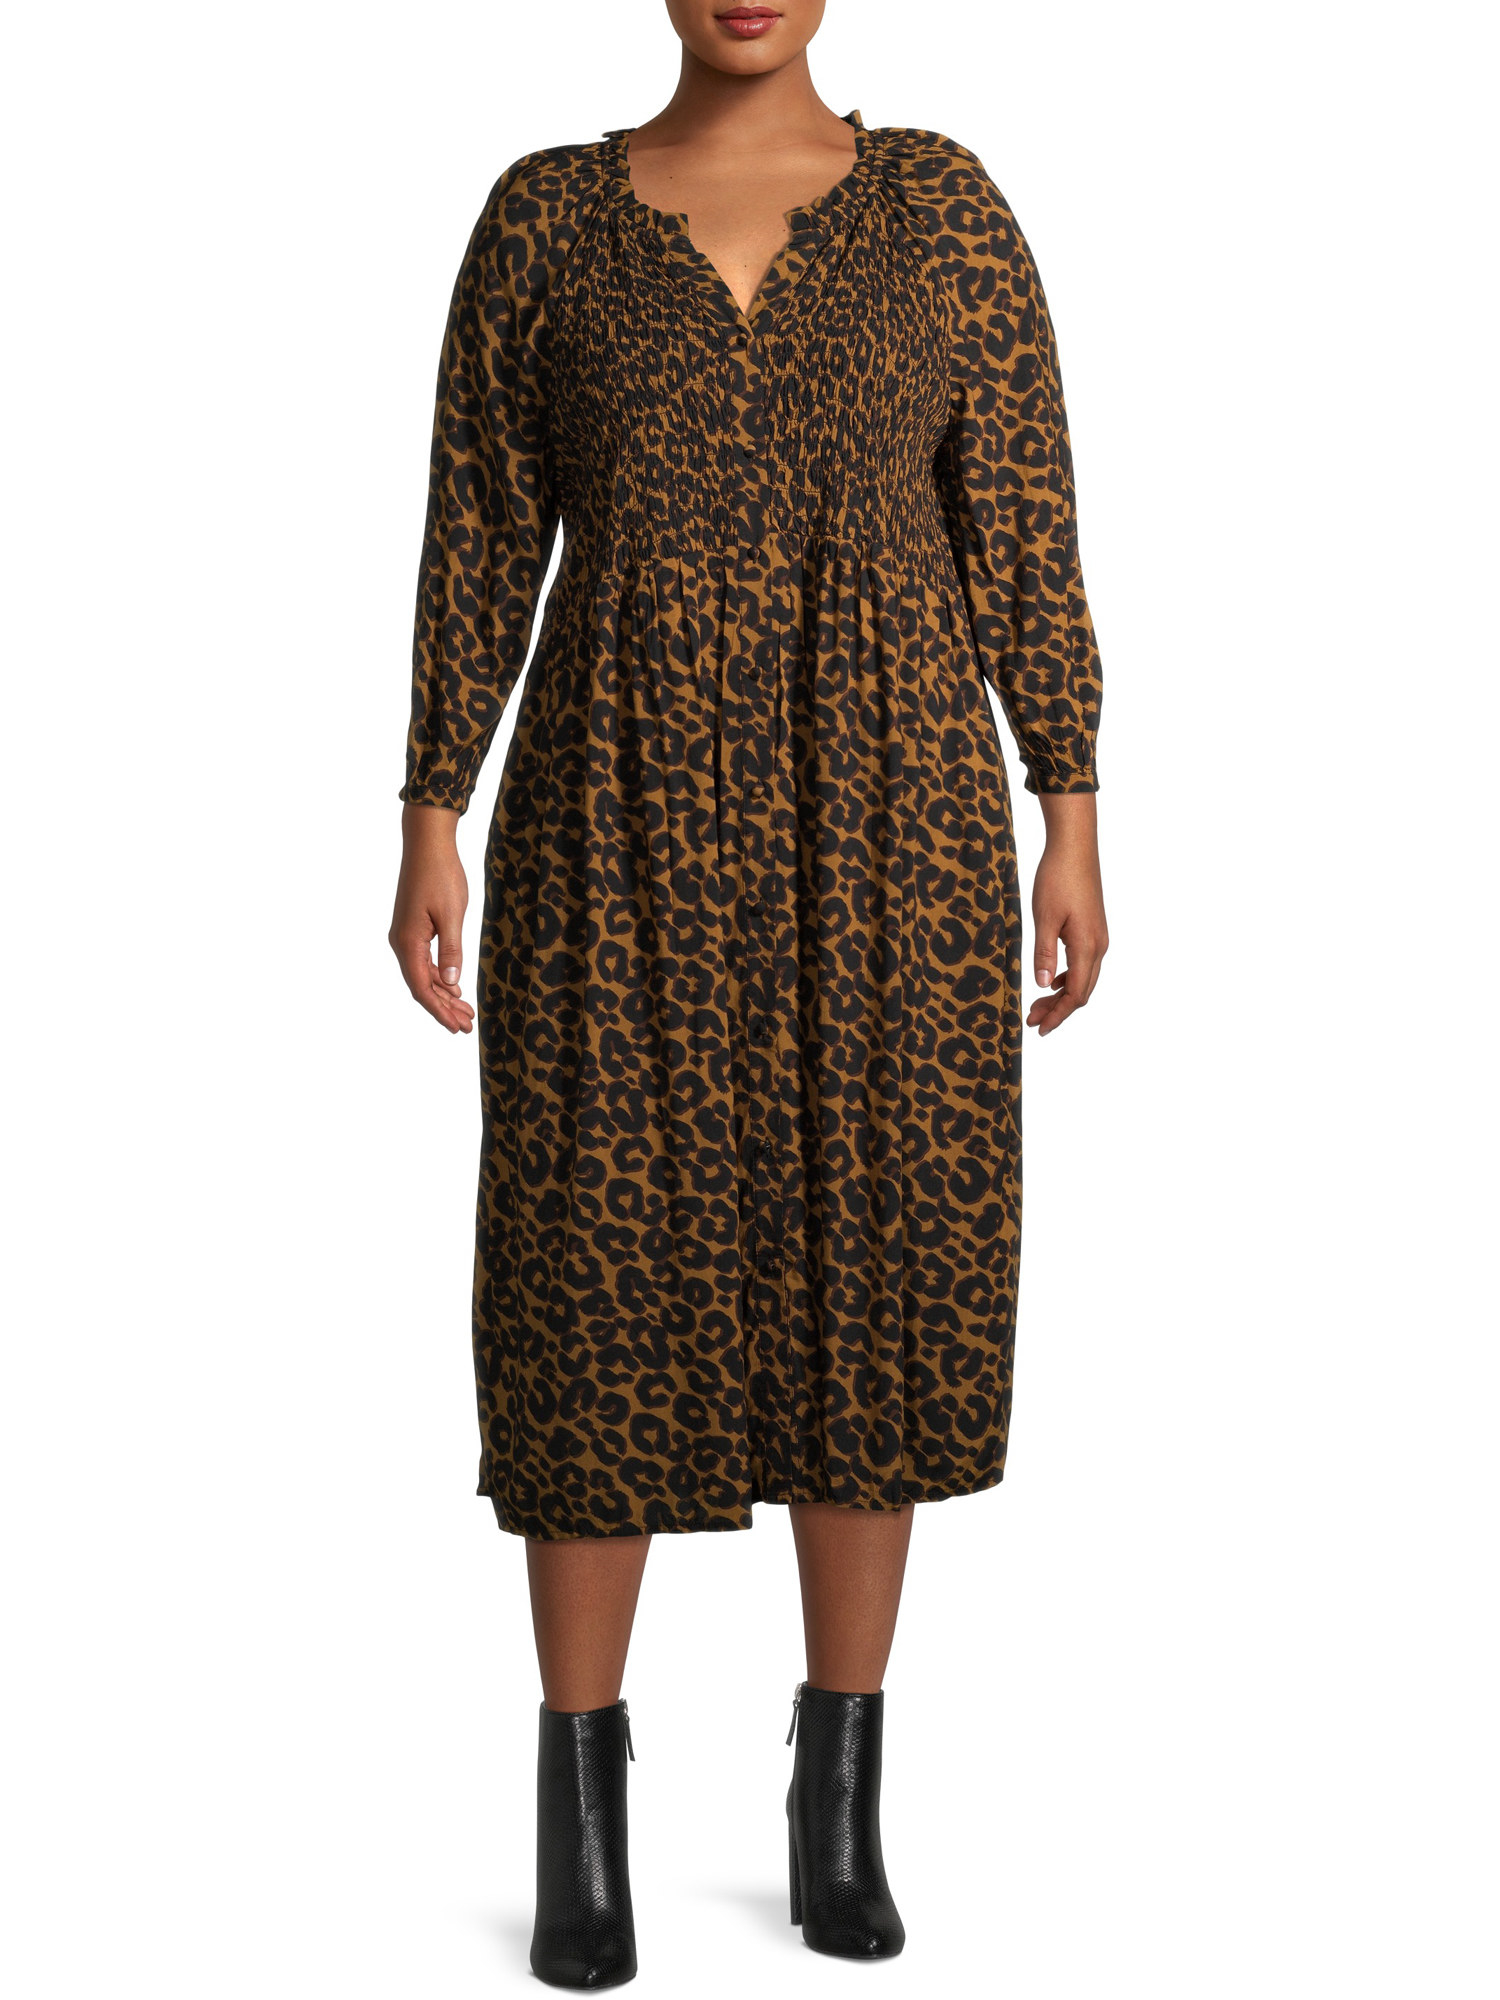 Model wearing cheetah print dress